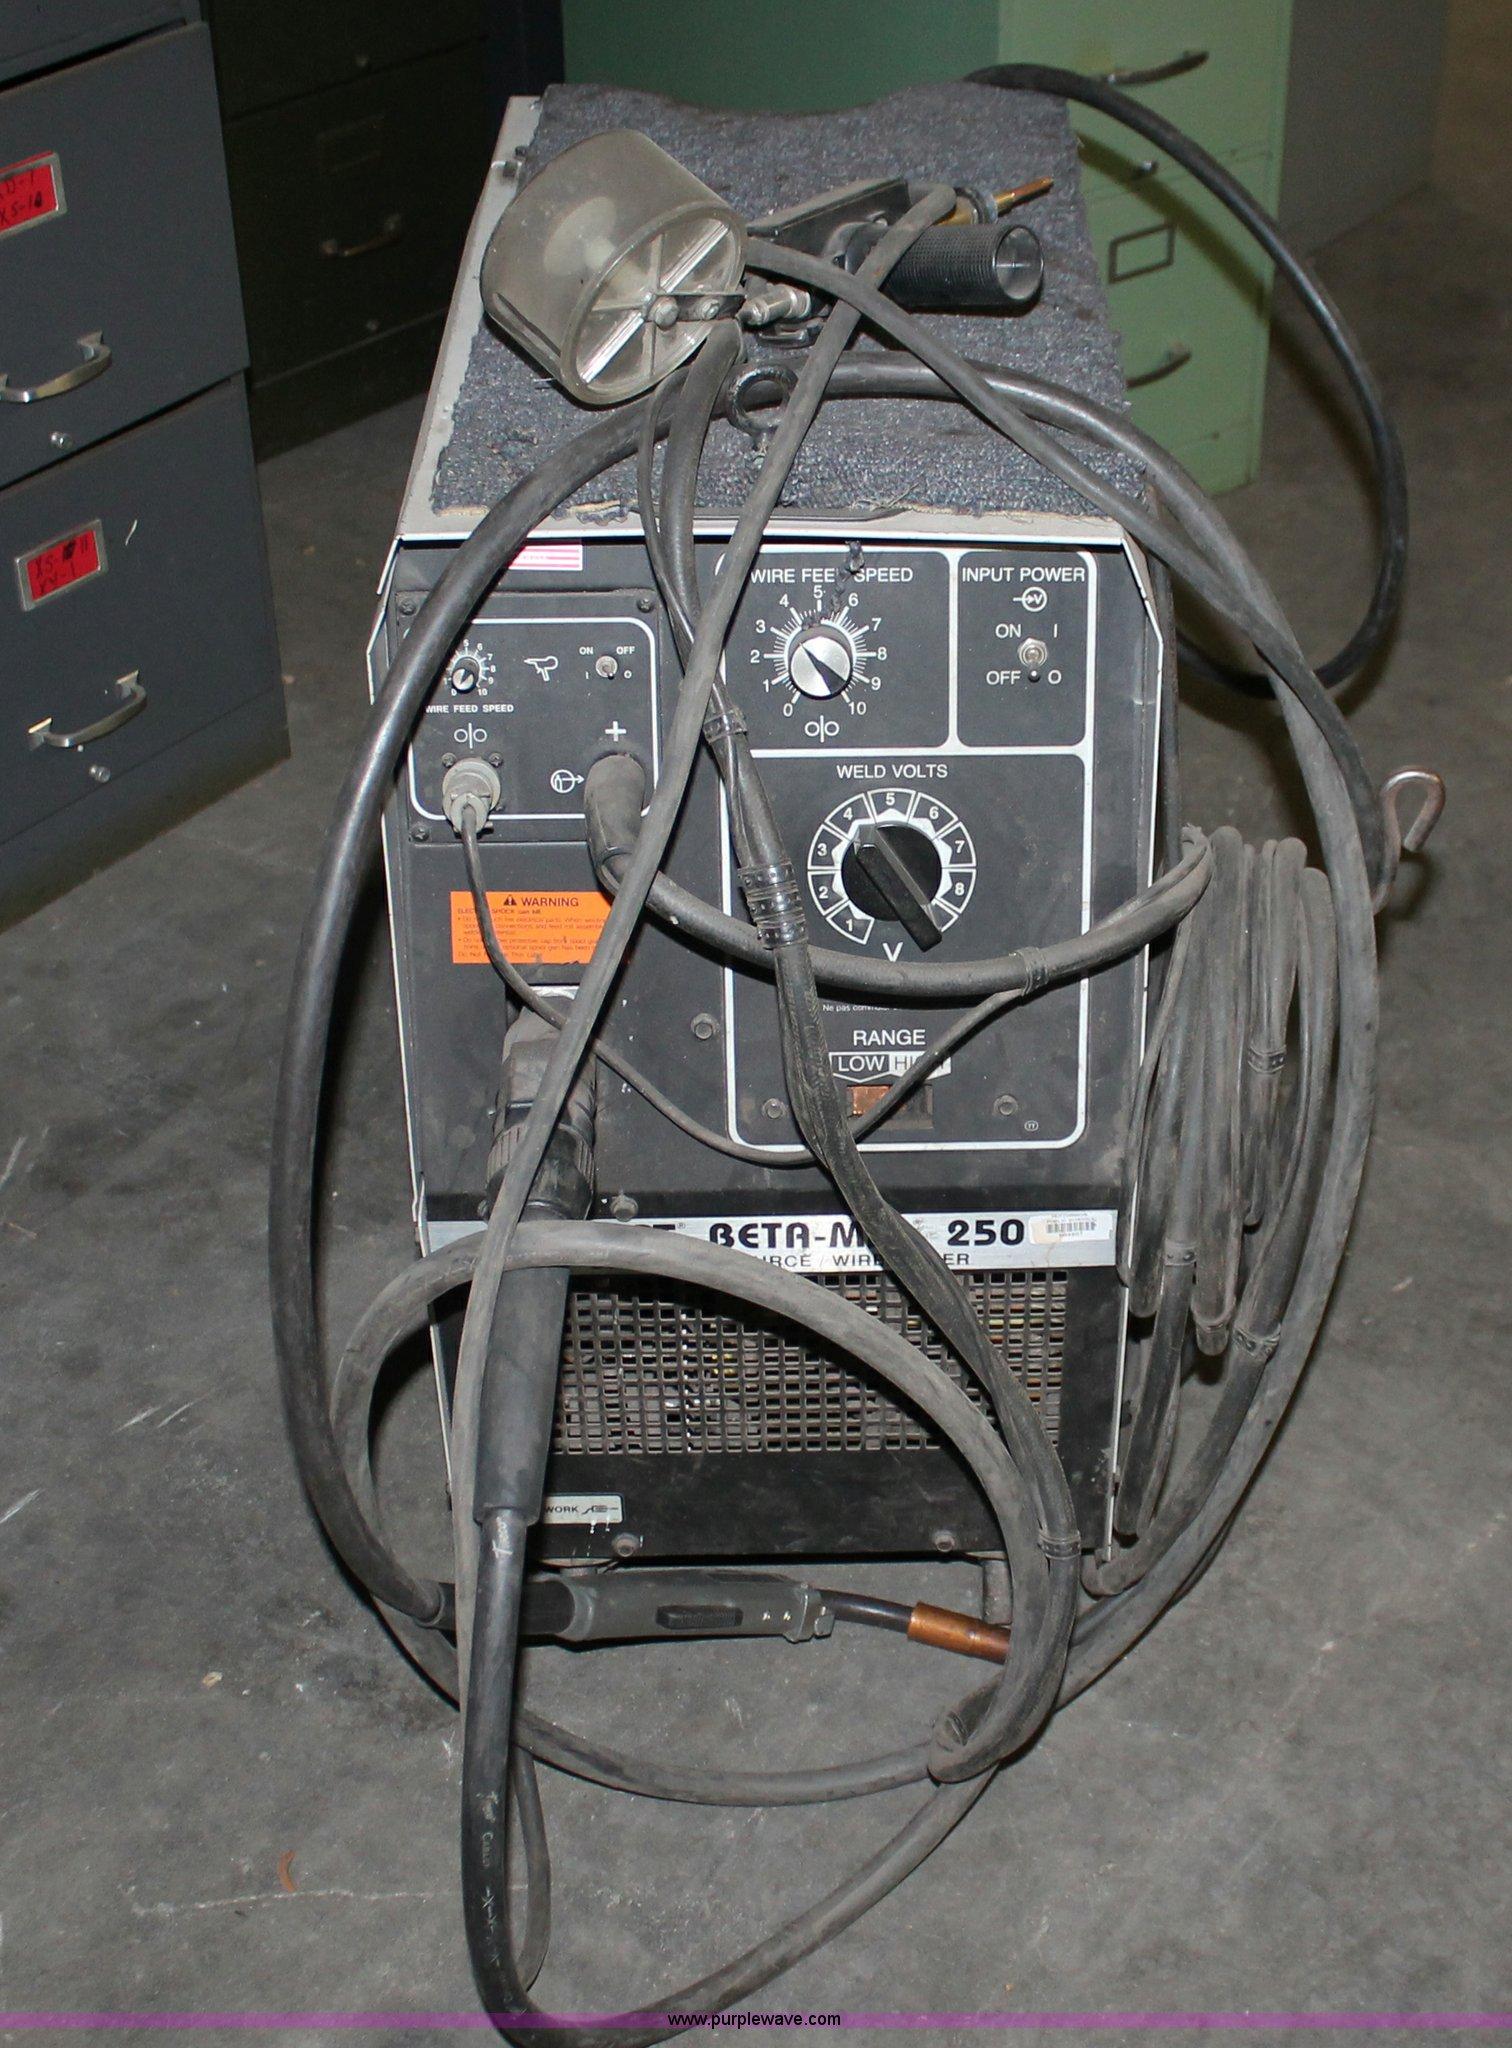 Hobart 250 Mig Welder Wiring Diagram Worksheet And 220 Volt Beta Cv Power Source Wire Feed Item Rh Purplewave Com